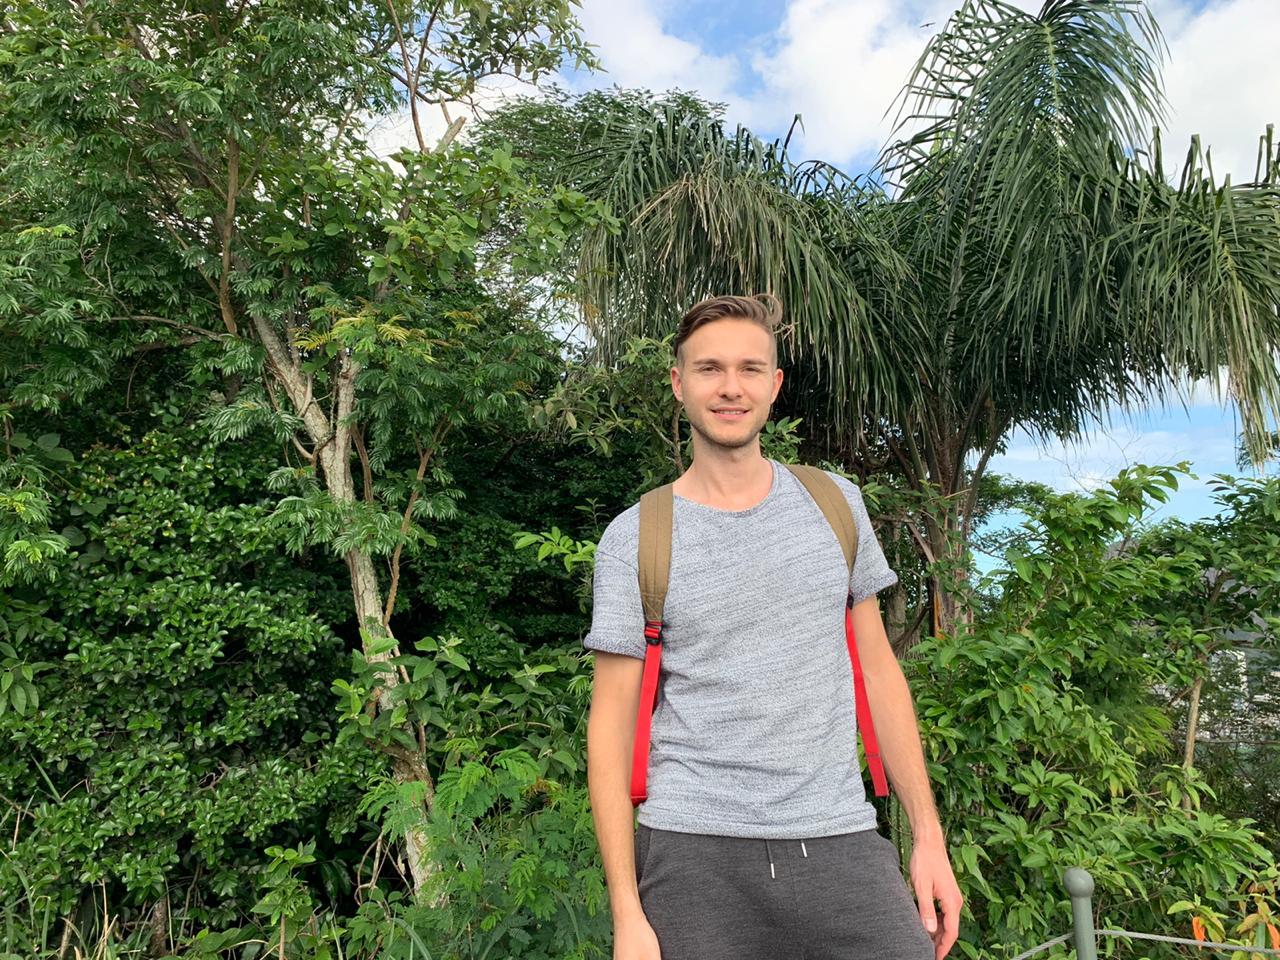 Student smiles at Catacumba Mountain